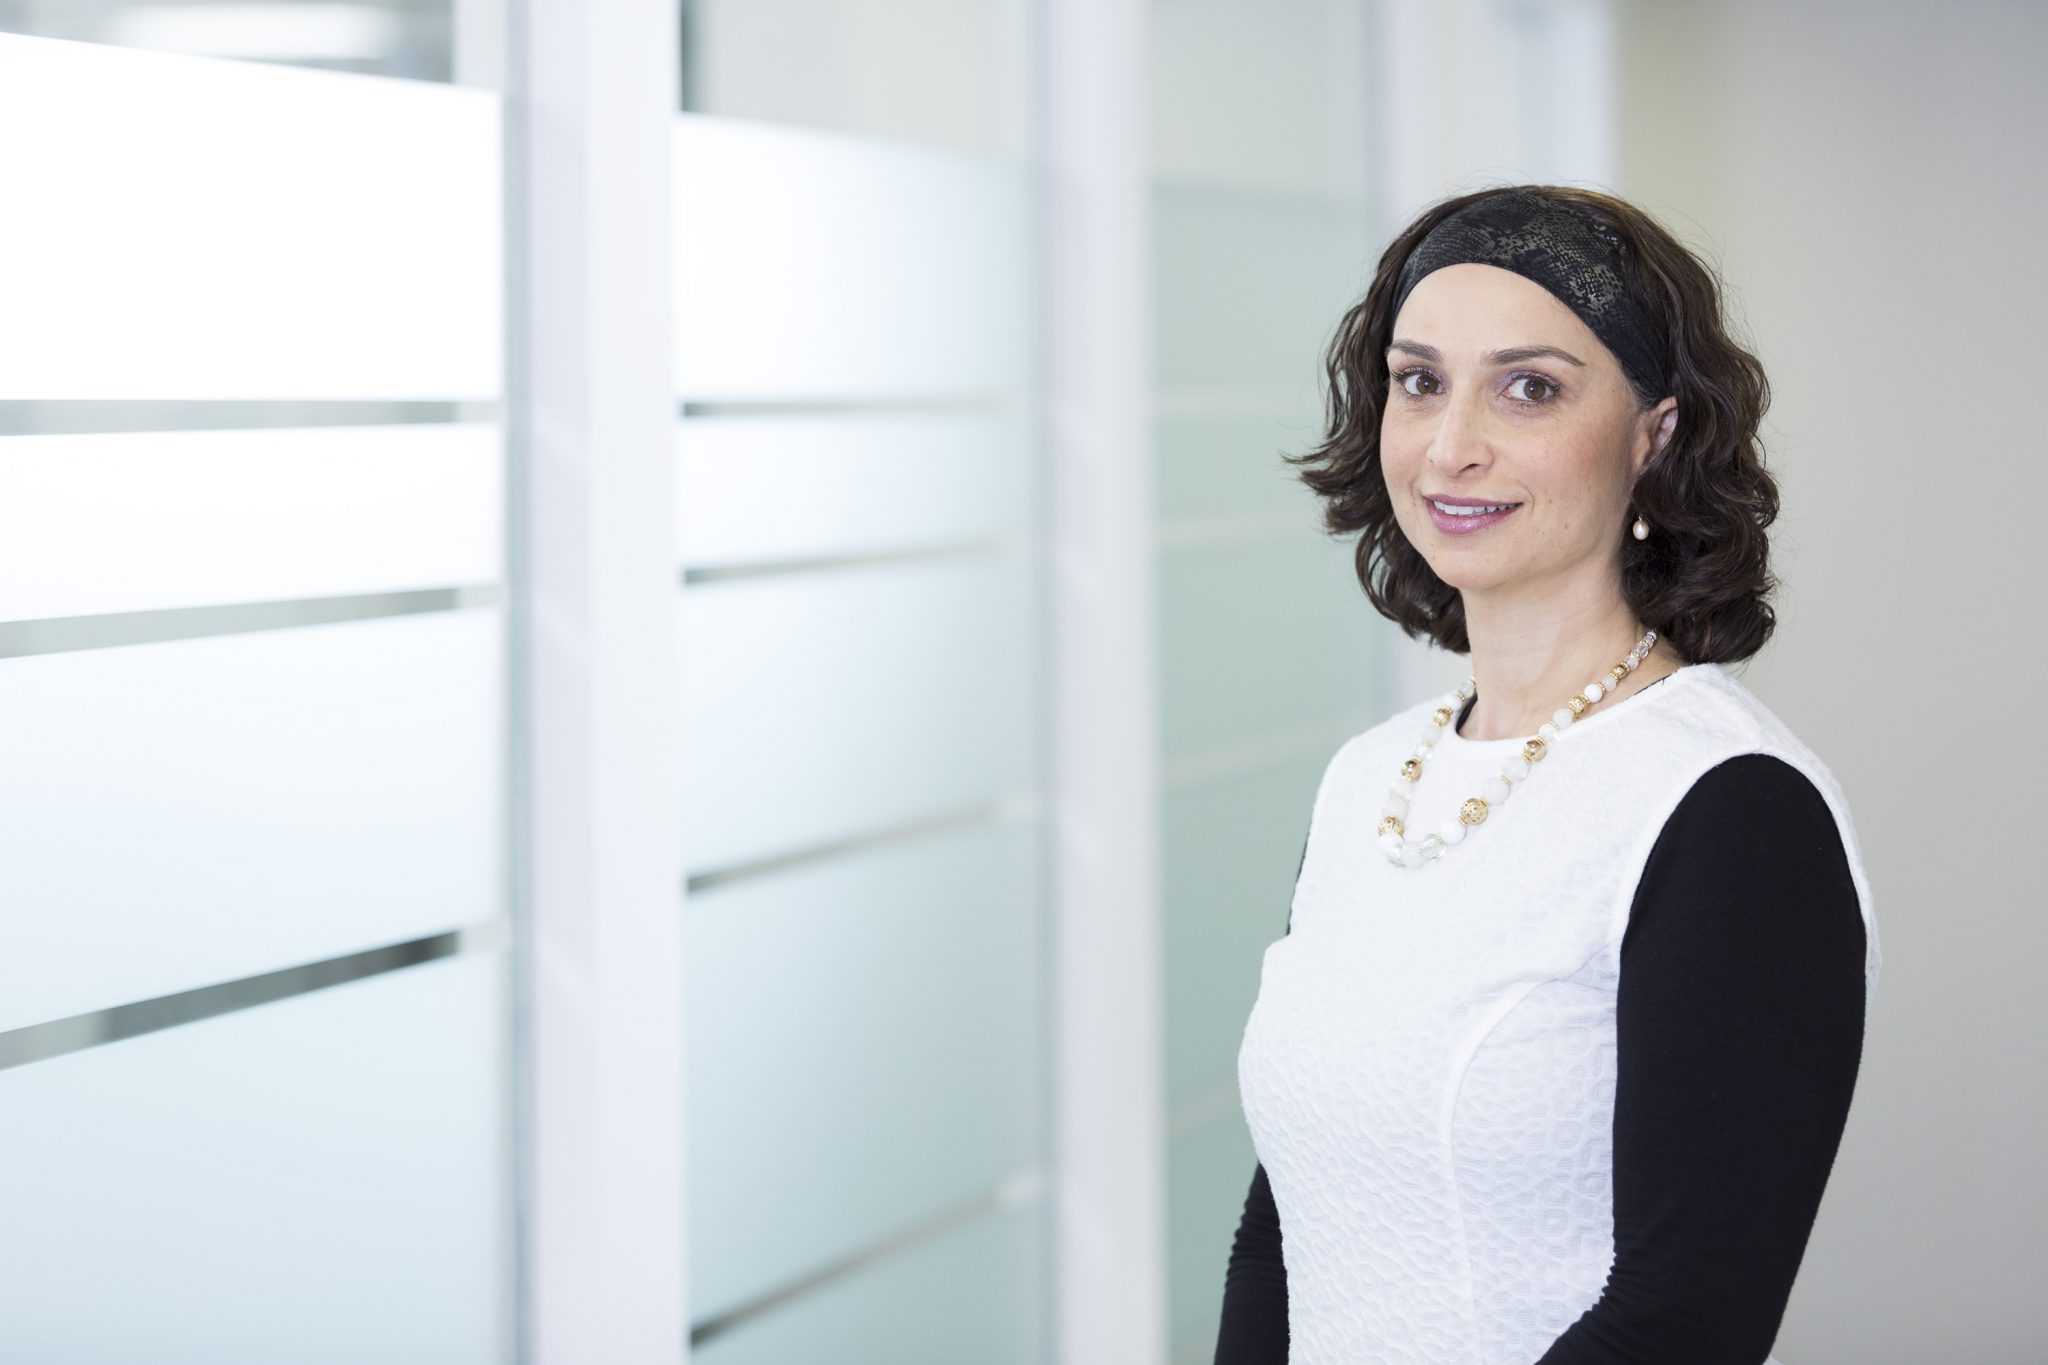 Lisa Koenigsberg, CTO of Israeli startup Physical Logic